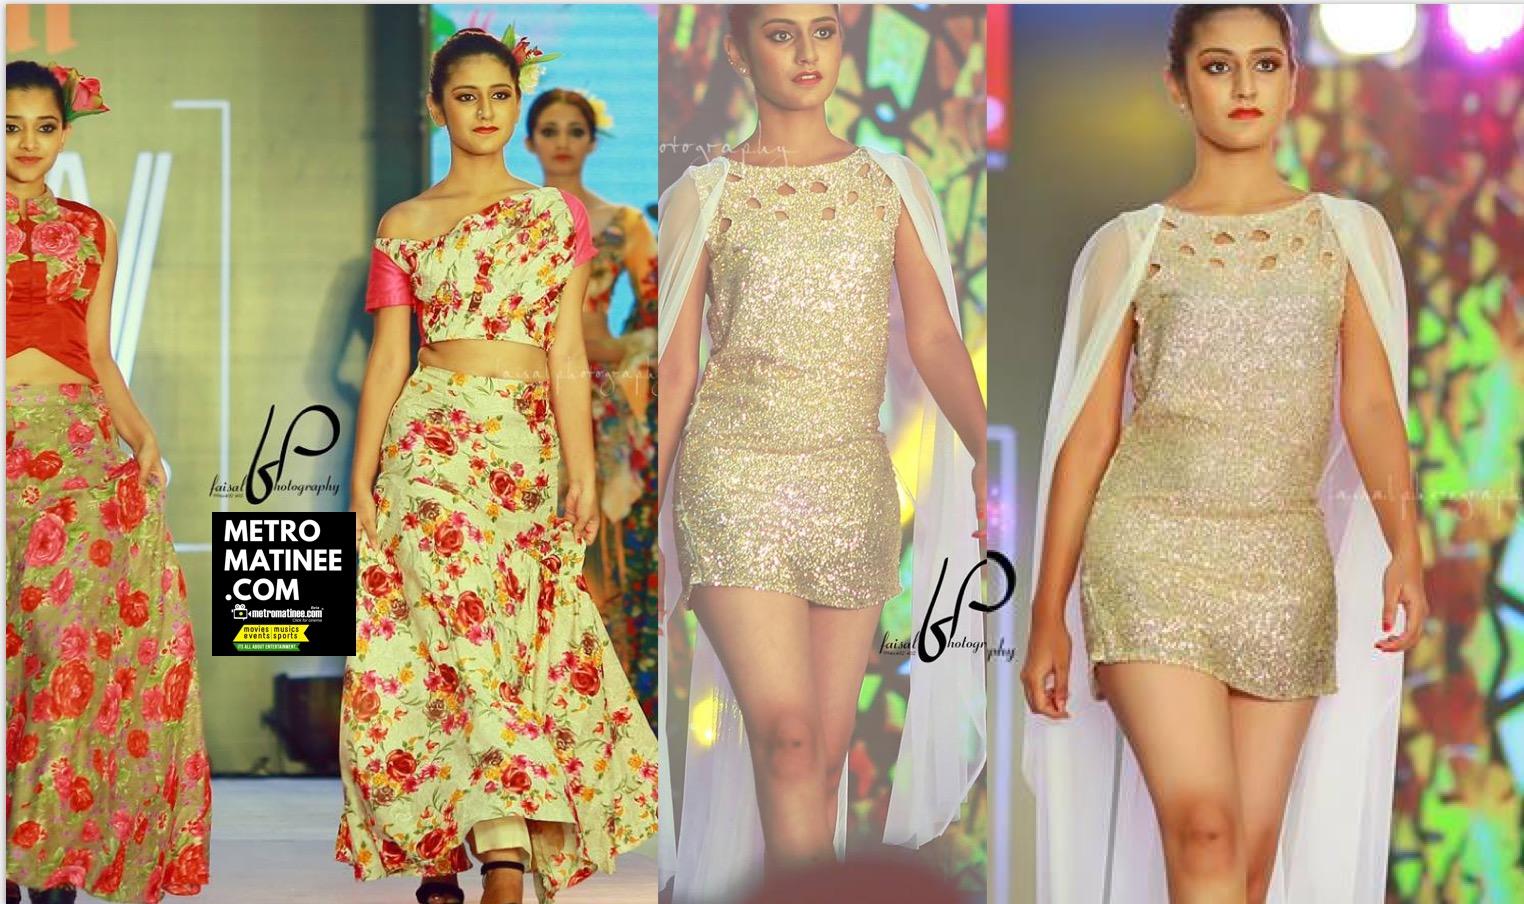 Priya Prakash Warrier Oru Adaar Love heroine Walks at Espanio Events Fashions Show